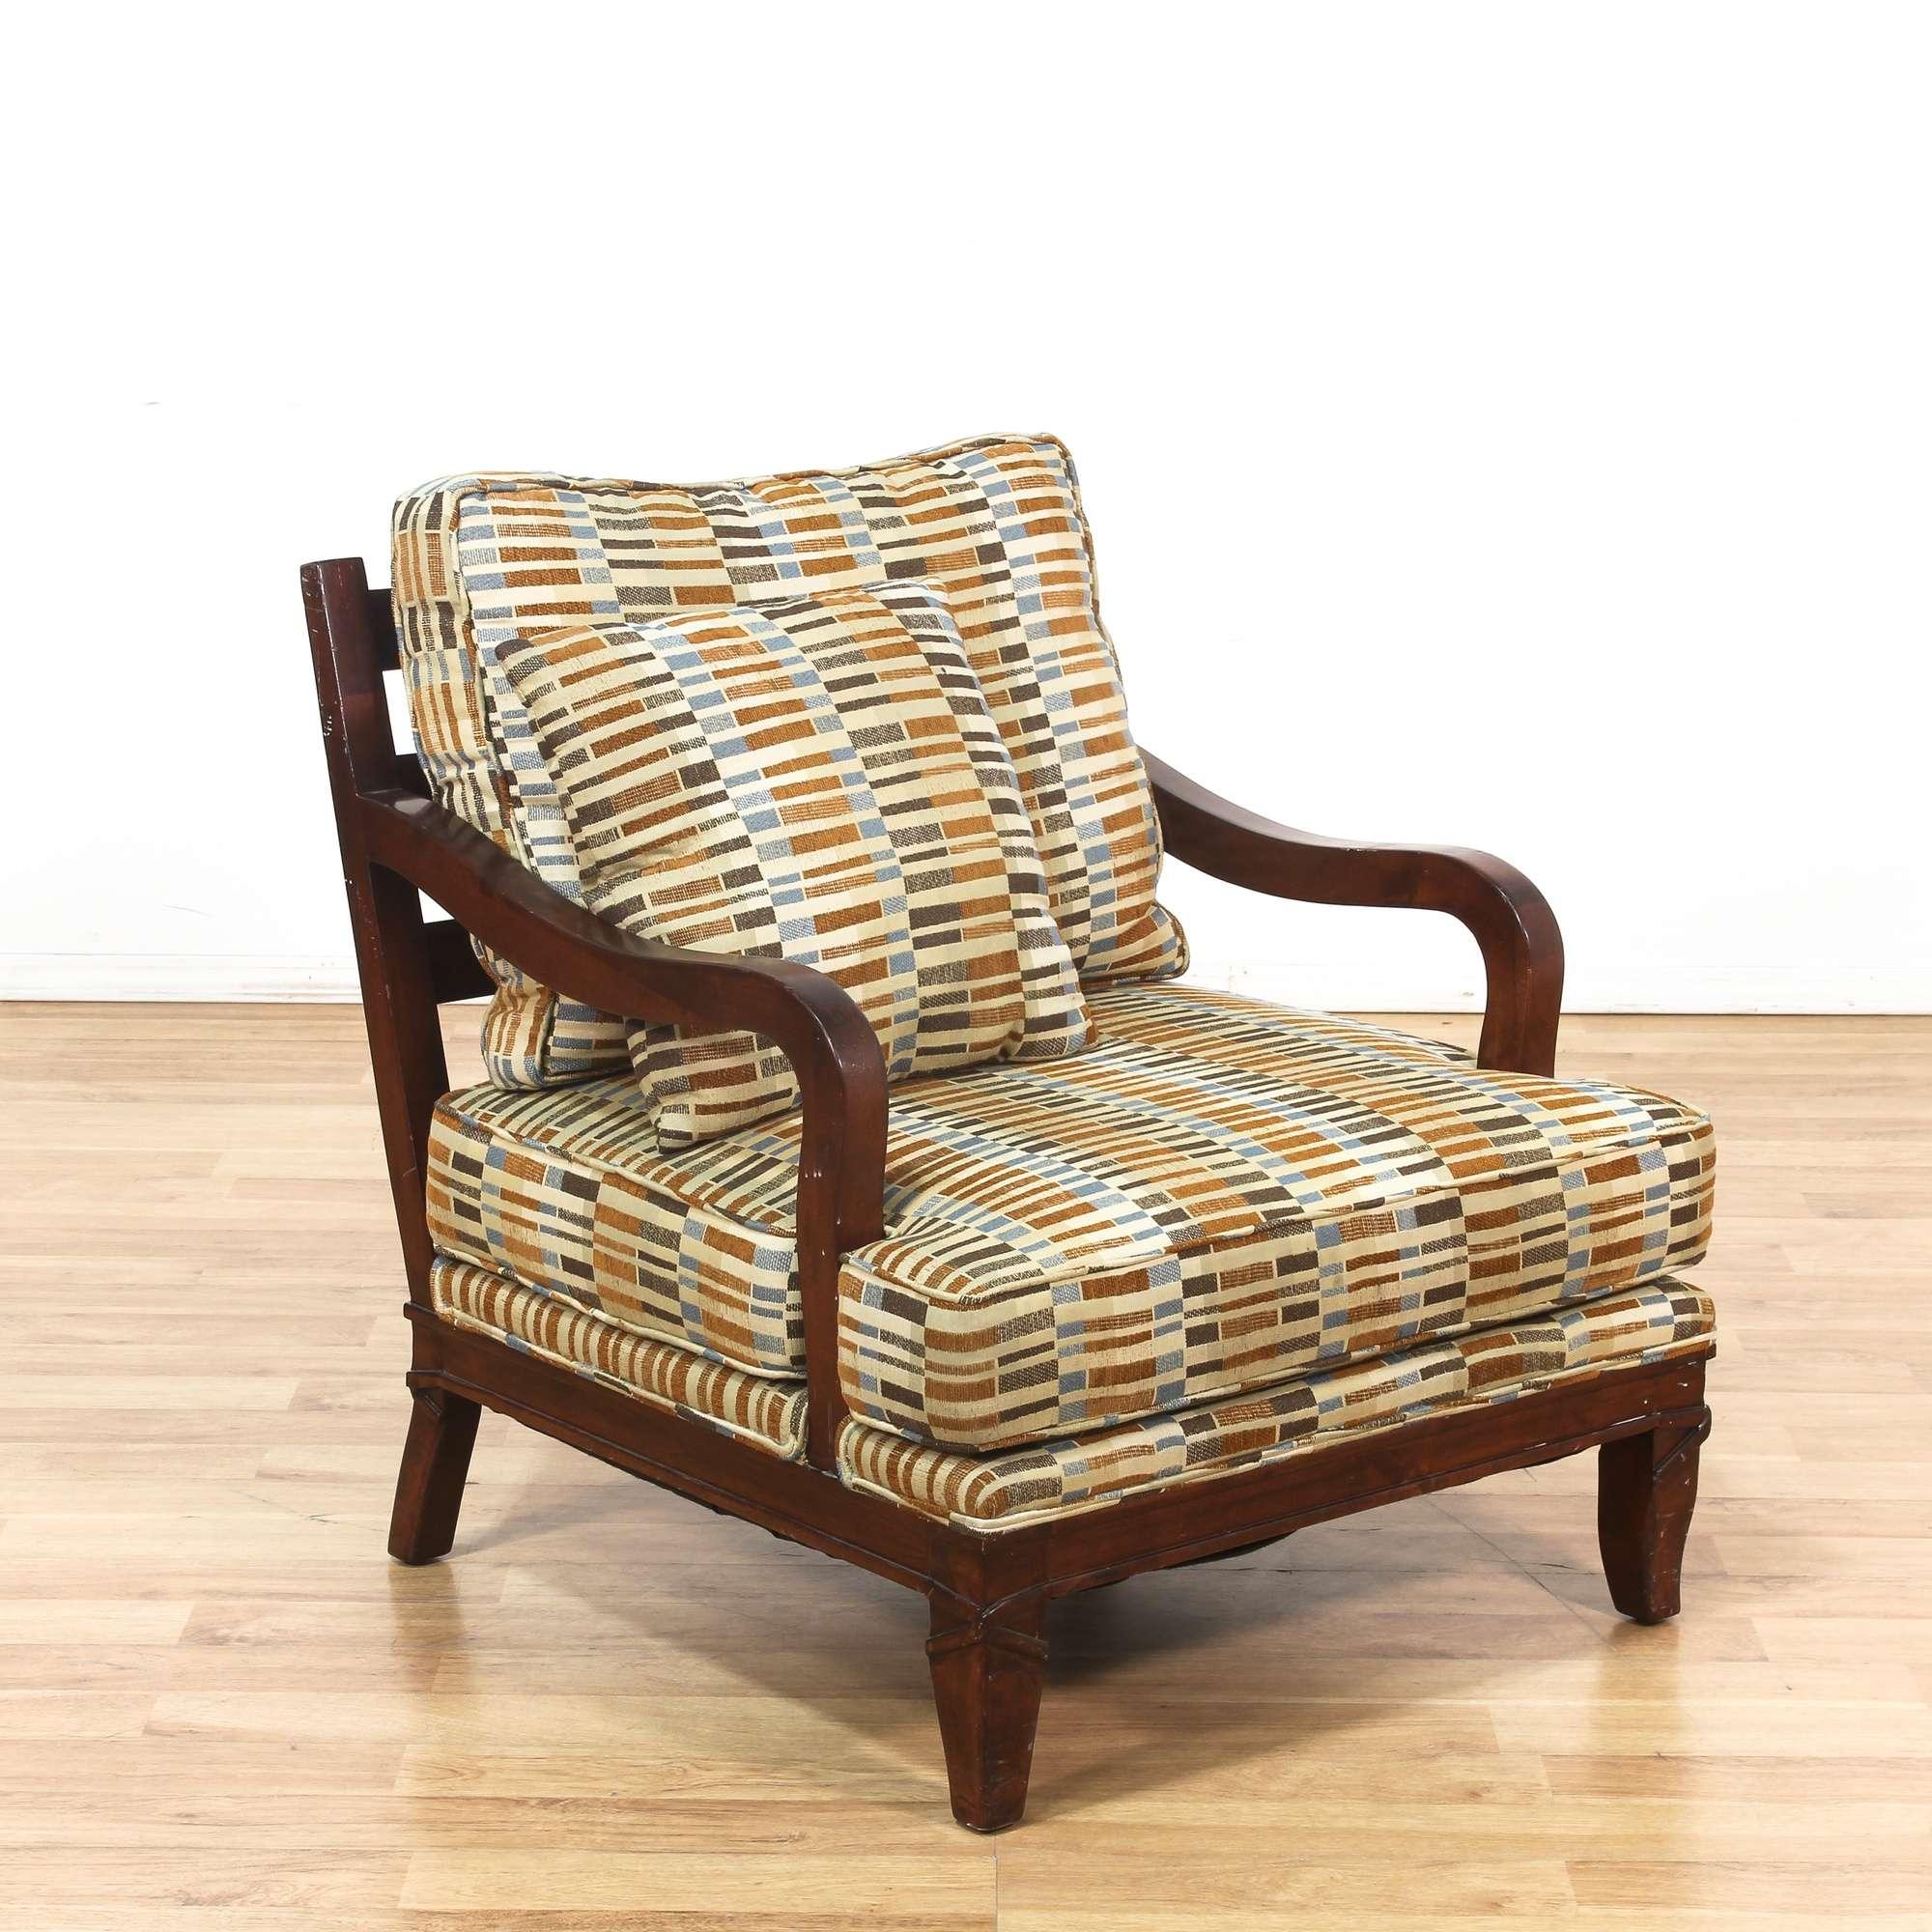 sofa glass patterned on looks loveseat for corner living splendid plus fur table room offers grey cushions and velvet square rug gray wonderful you white sectional